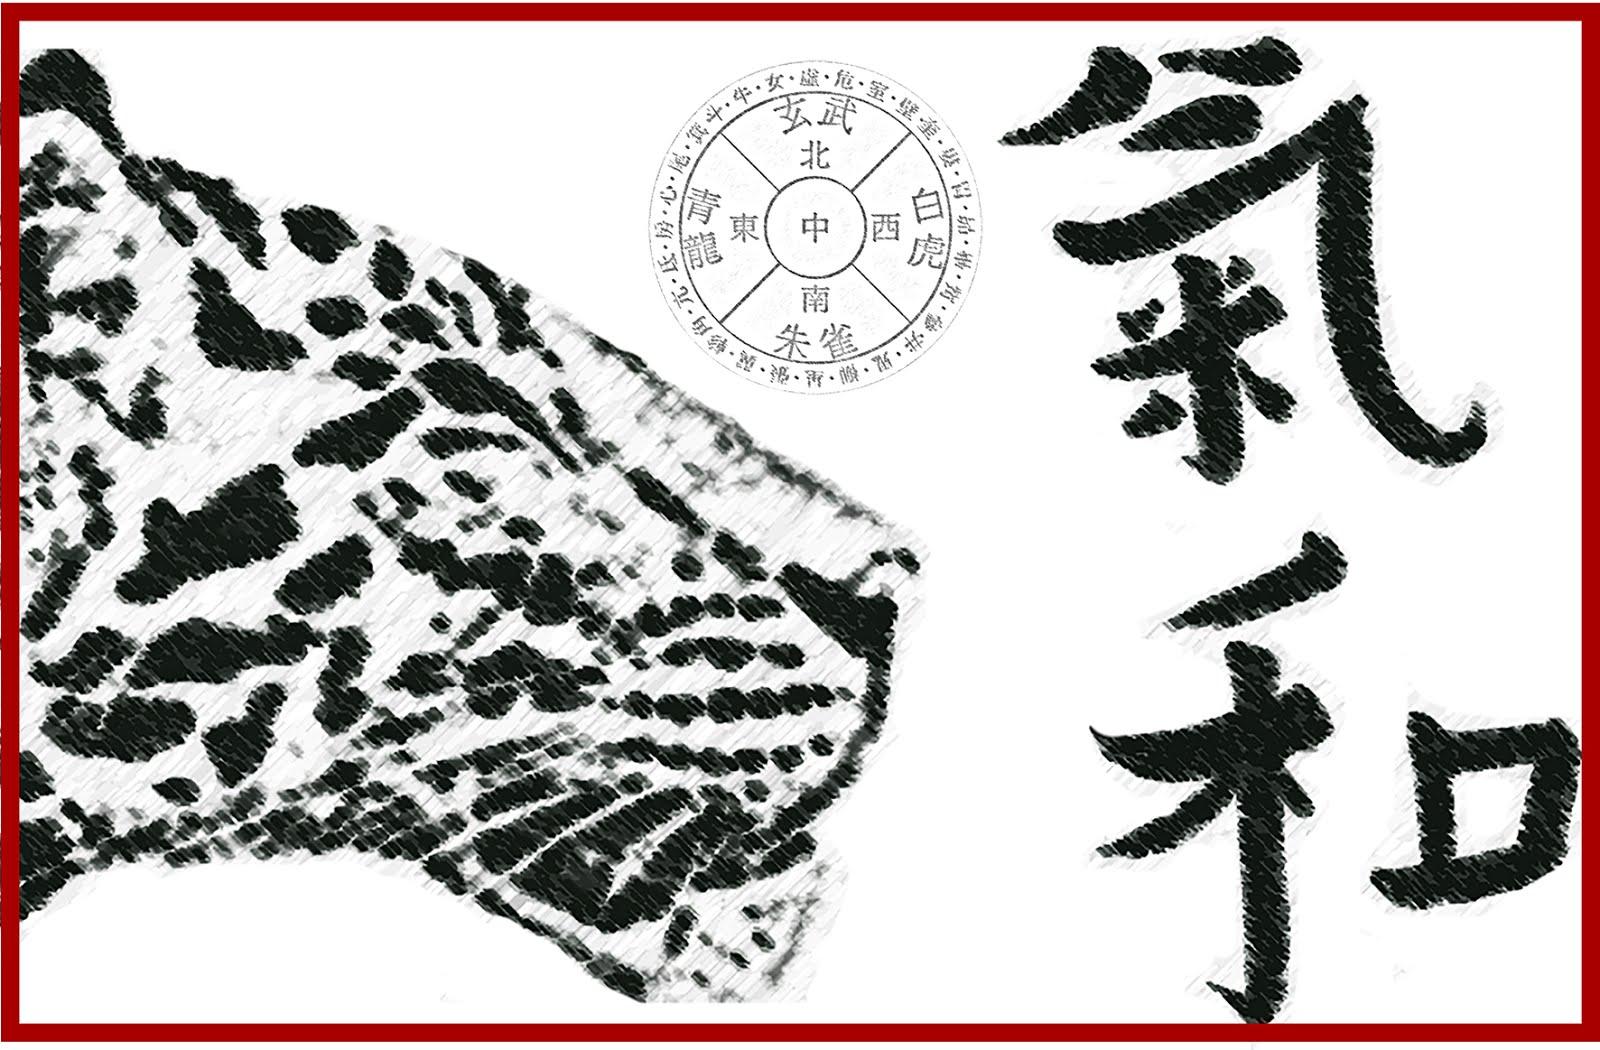 Tao Qi Hé